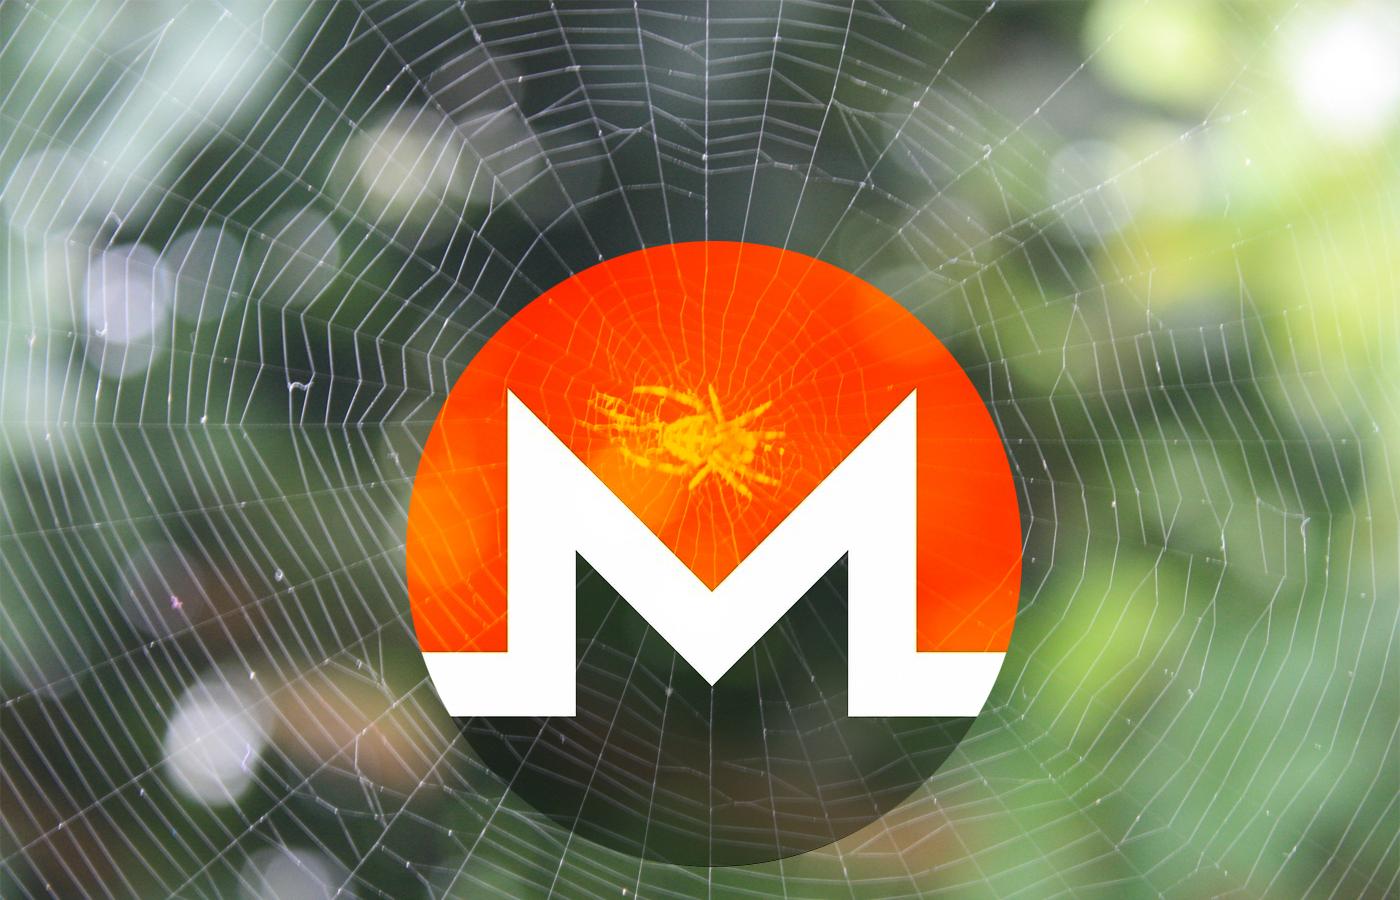 Corporate Systems Fall Prey To Monero Mining Malware